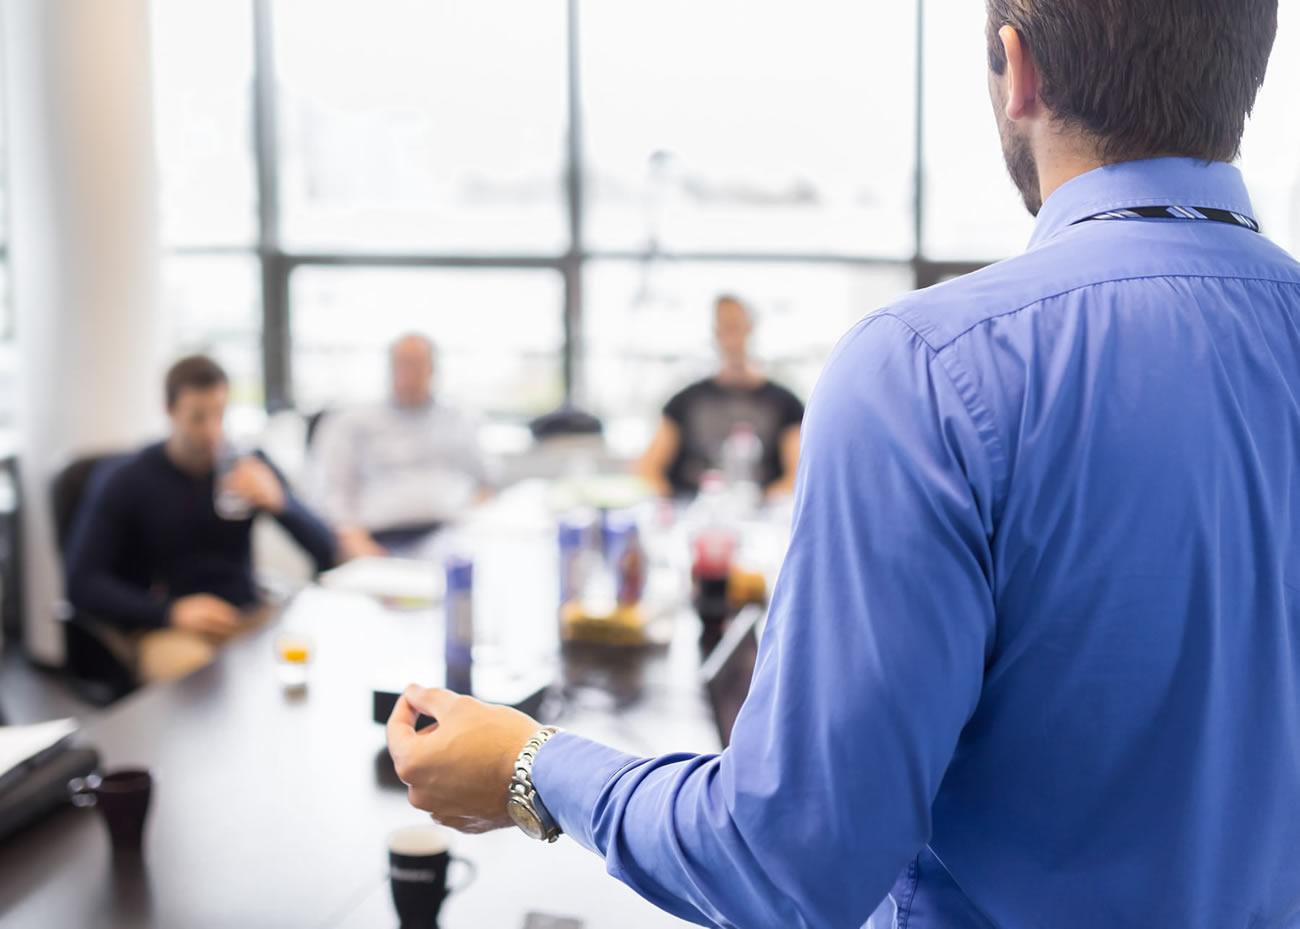 naem-2018-concept-business-man-making-presentation-office-executive-700x500